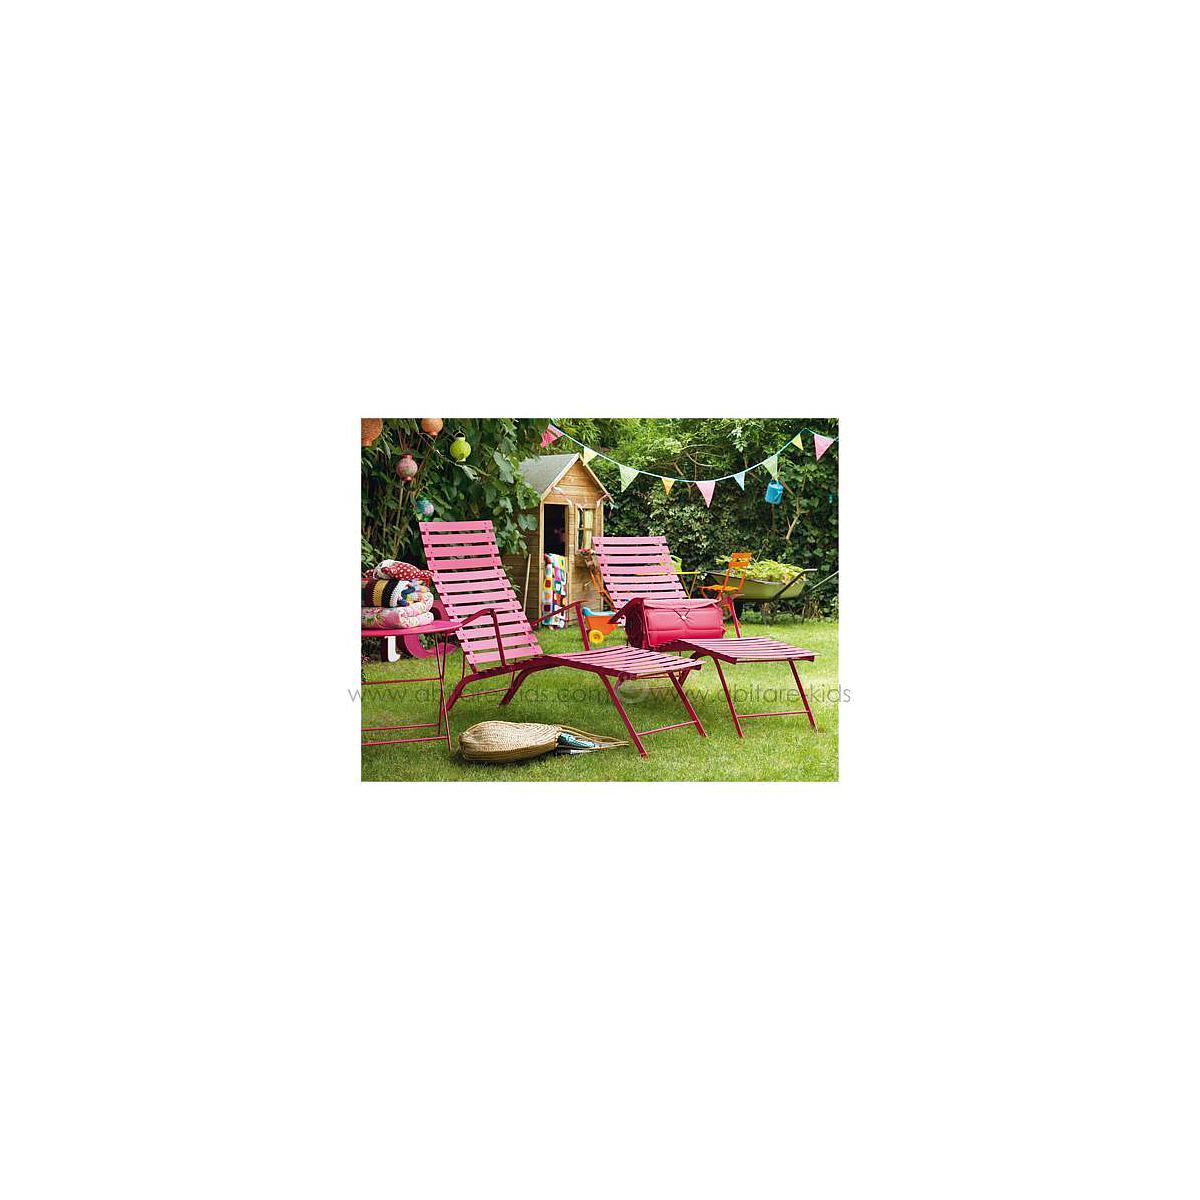 BISTRO  by Fermob Coussin pour chaise longue violet prune